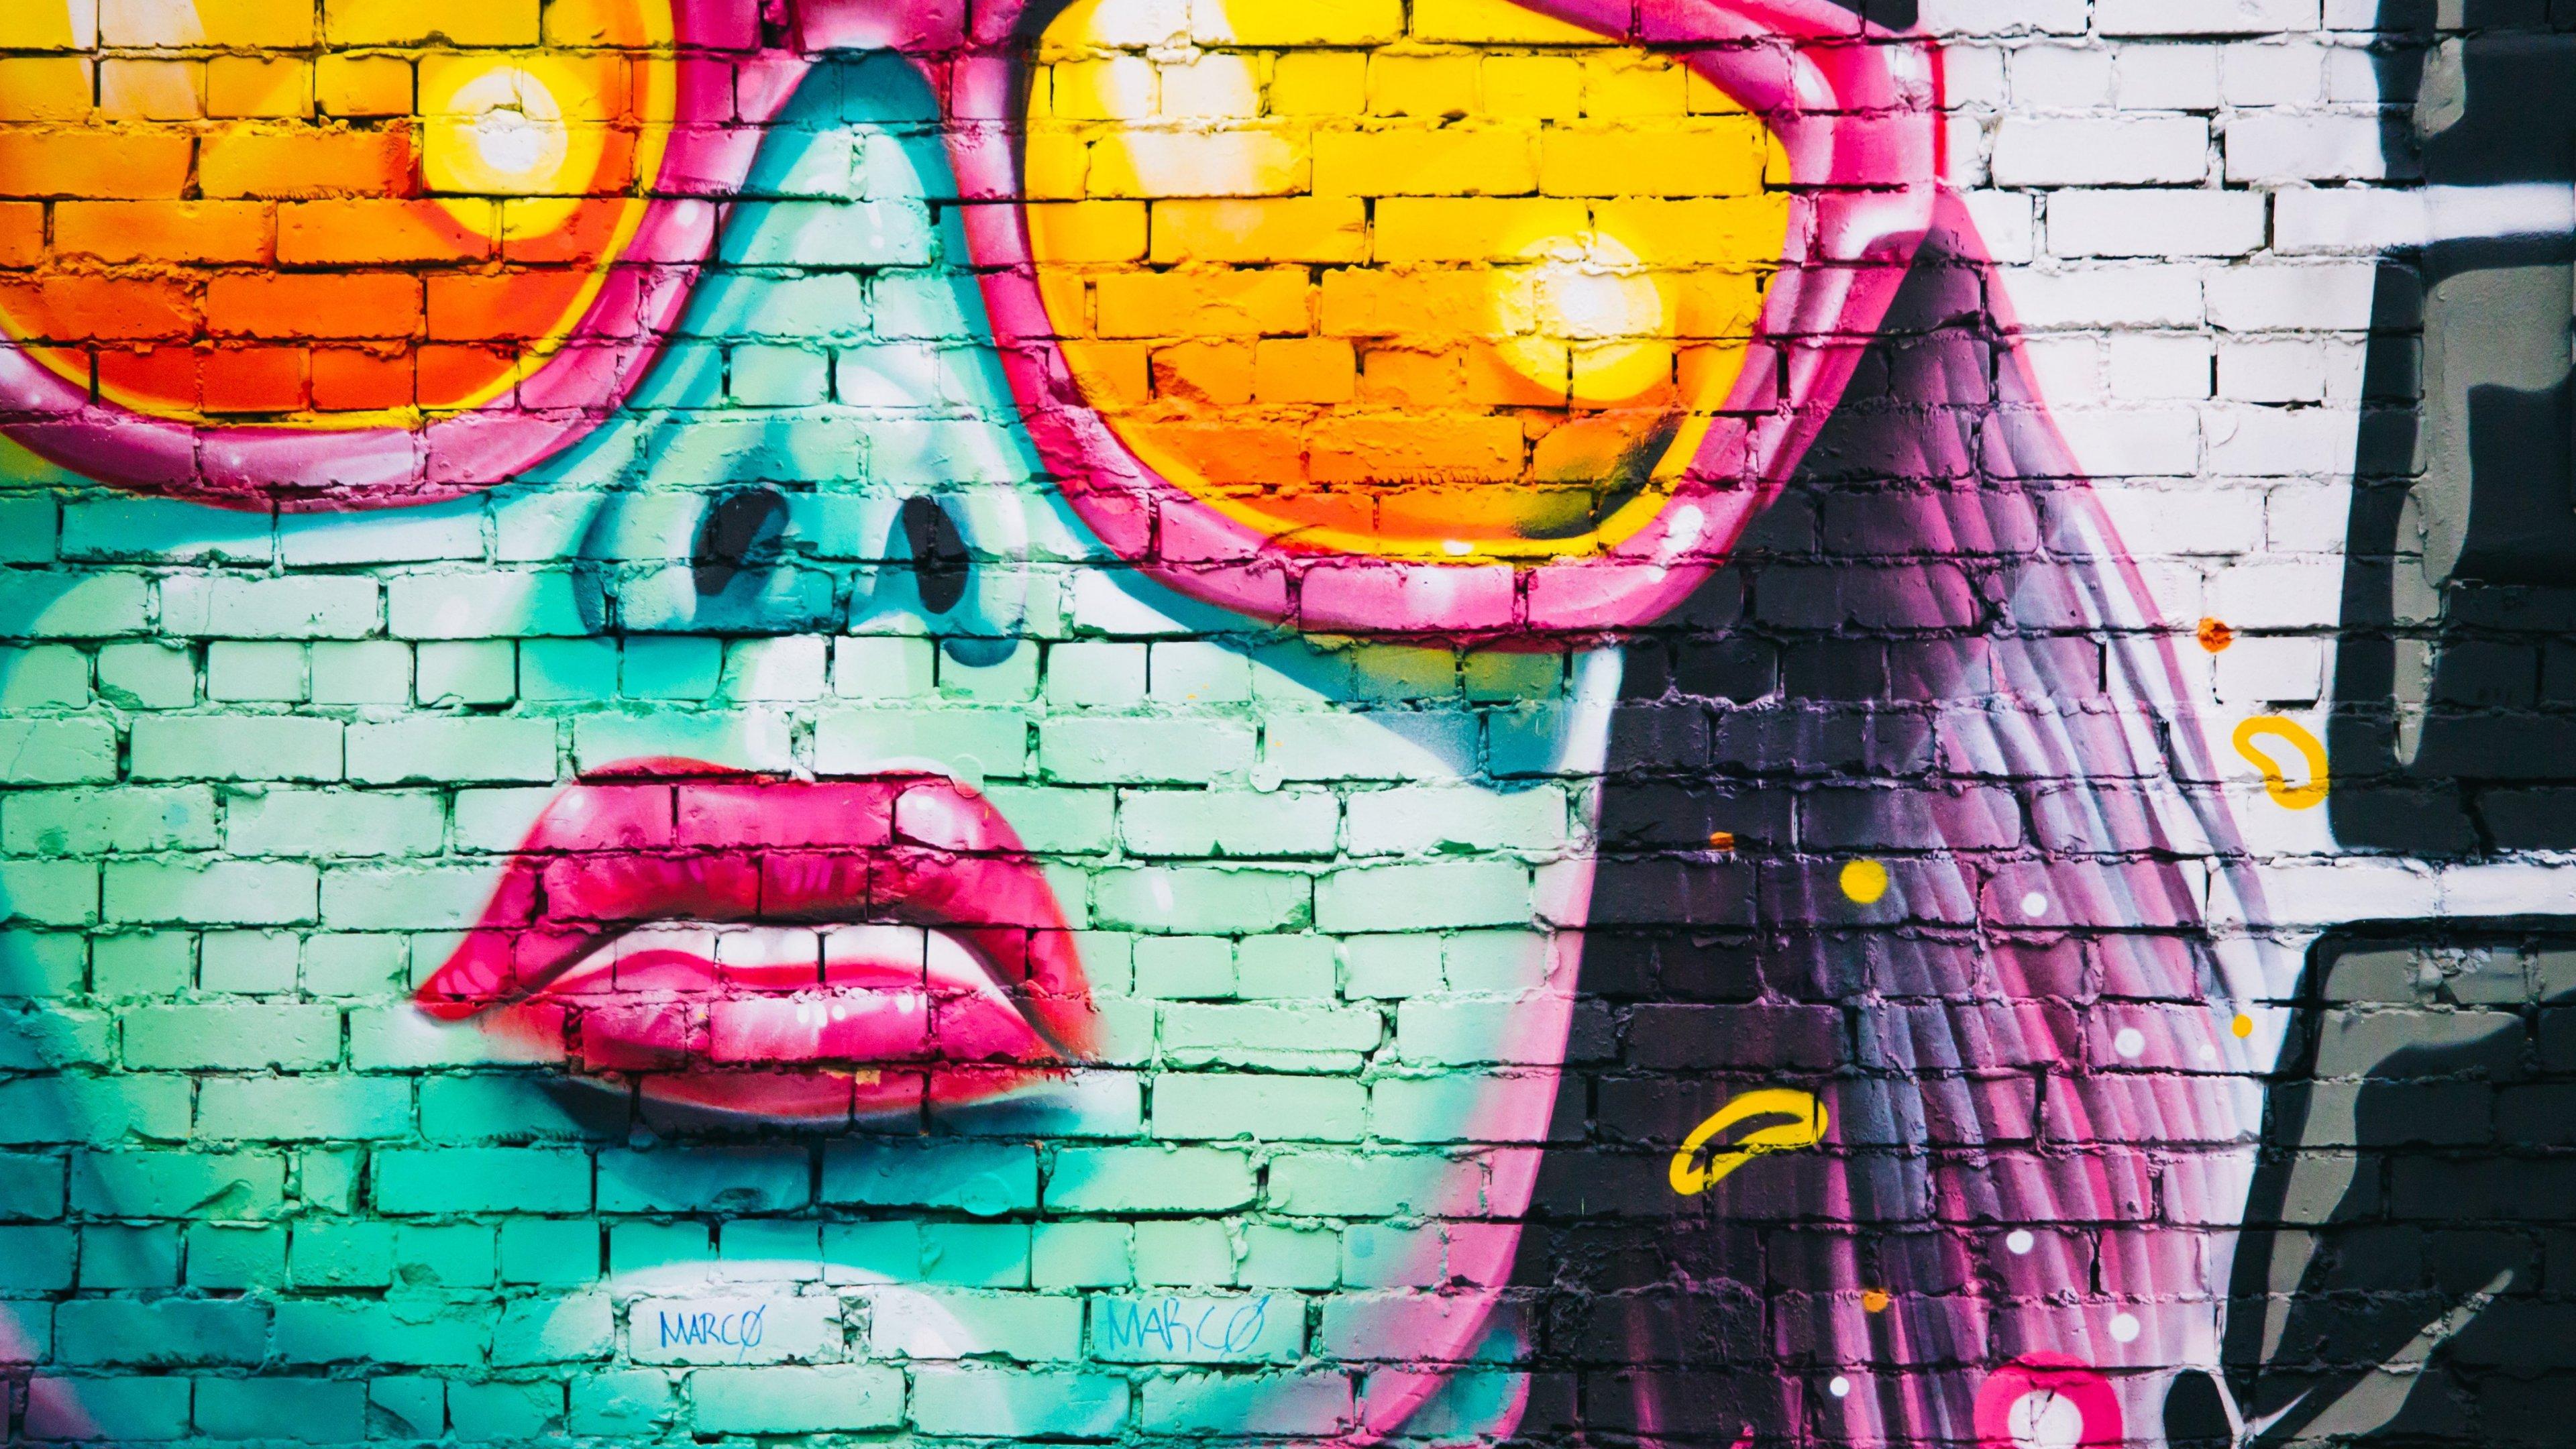 Graffiti Wallpaper for Mobile, Desktop, HD